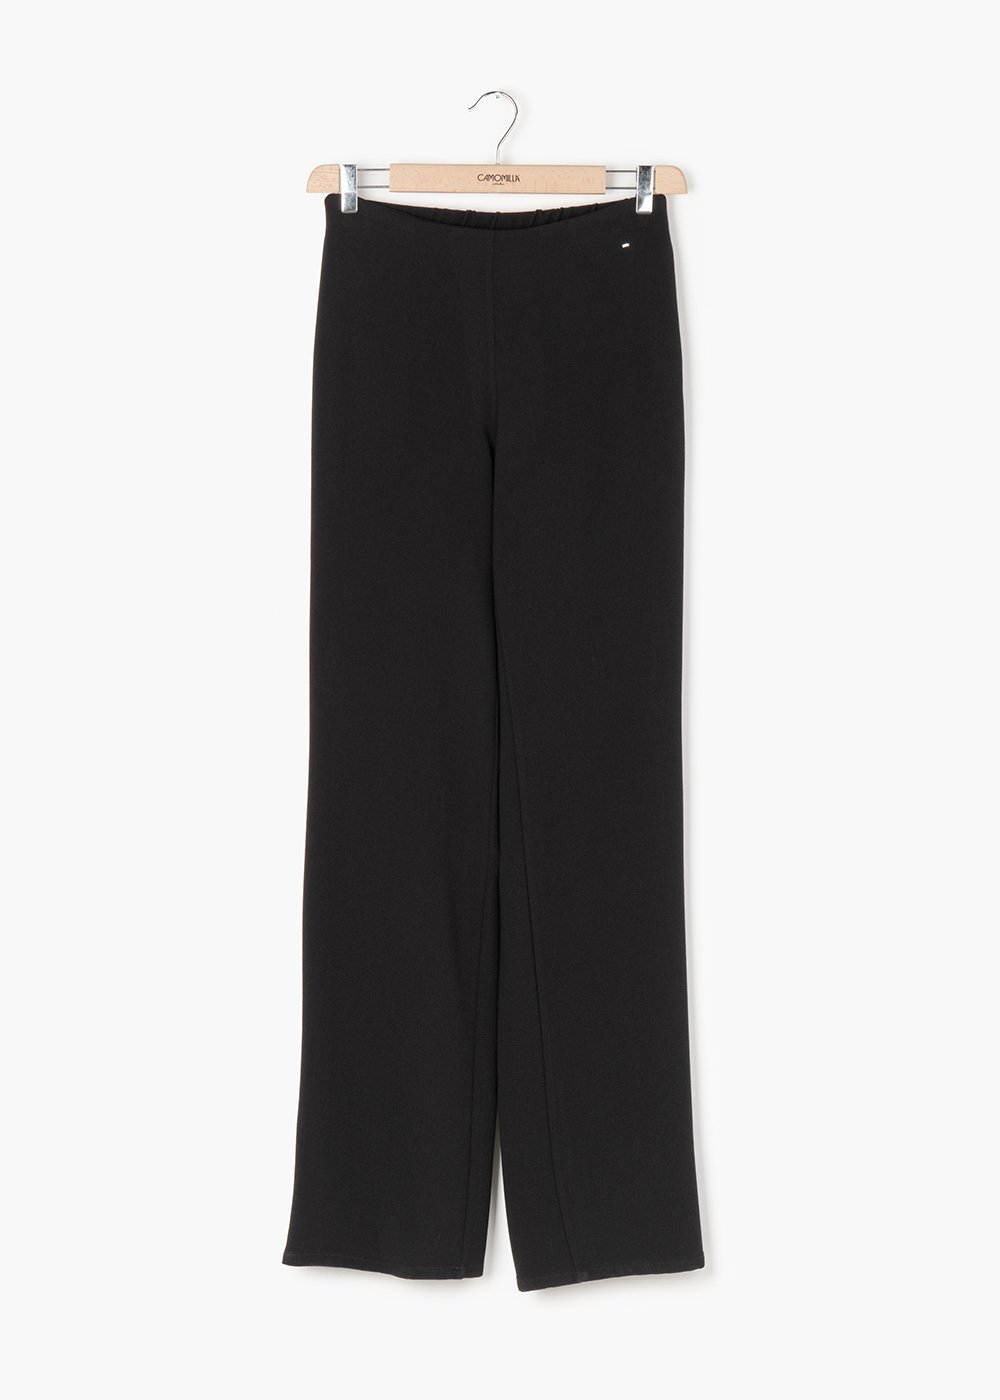 Ashley pants in crepe fabric - Black - Woman